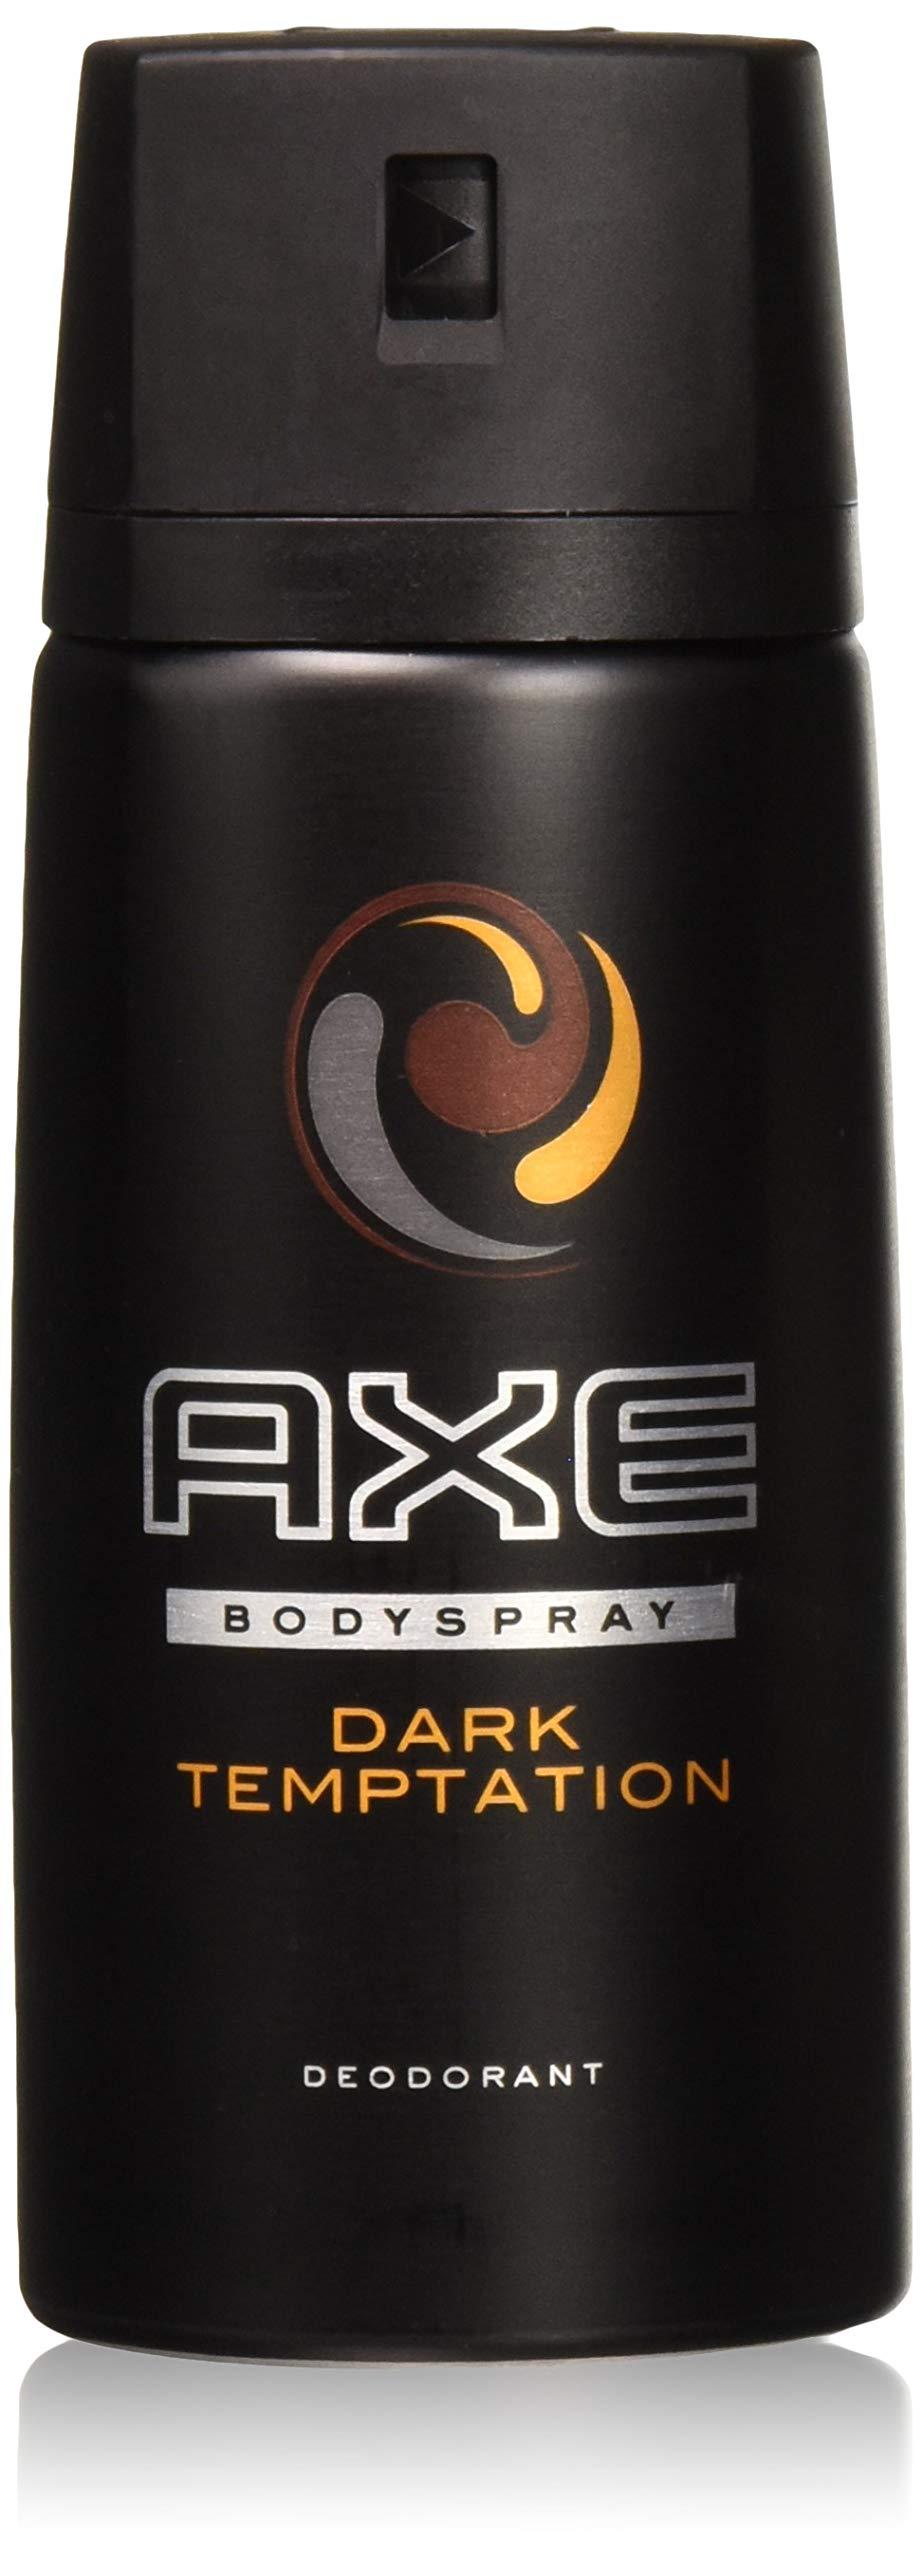 AXE Deodorant Body Spray Dark Temptation 150 Ml / 5.07 Oz (Pack of 6)